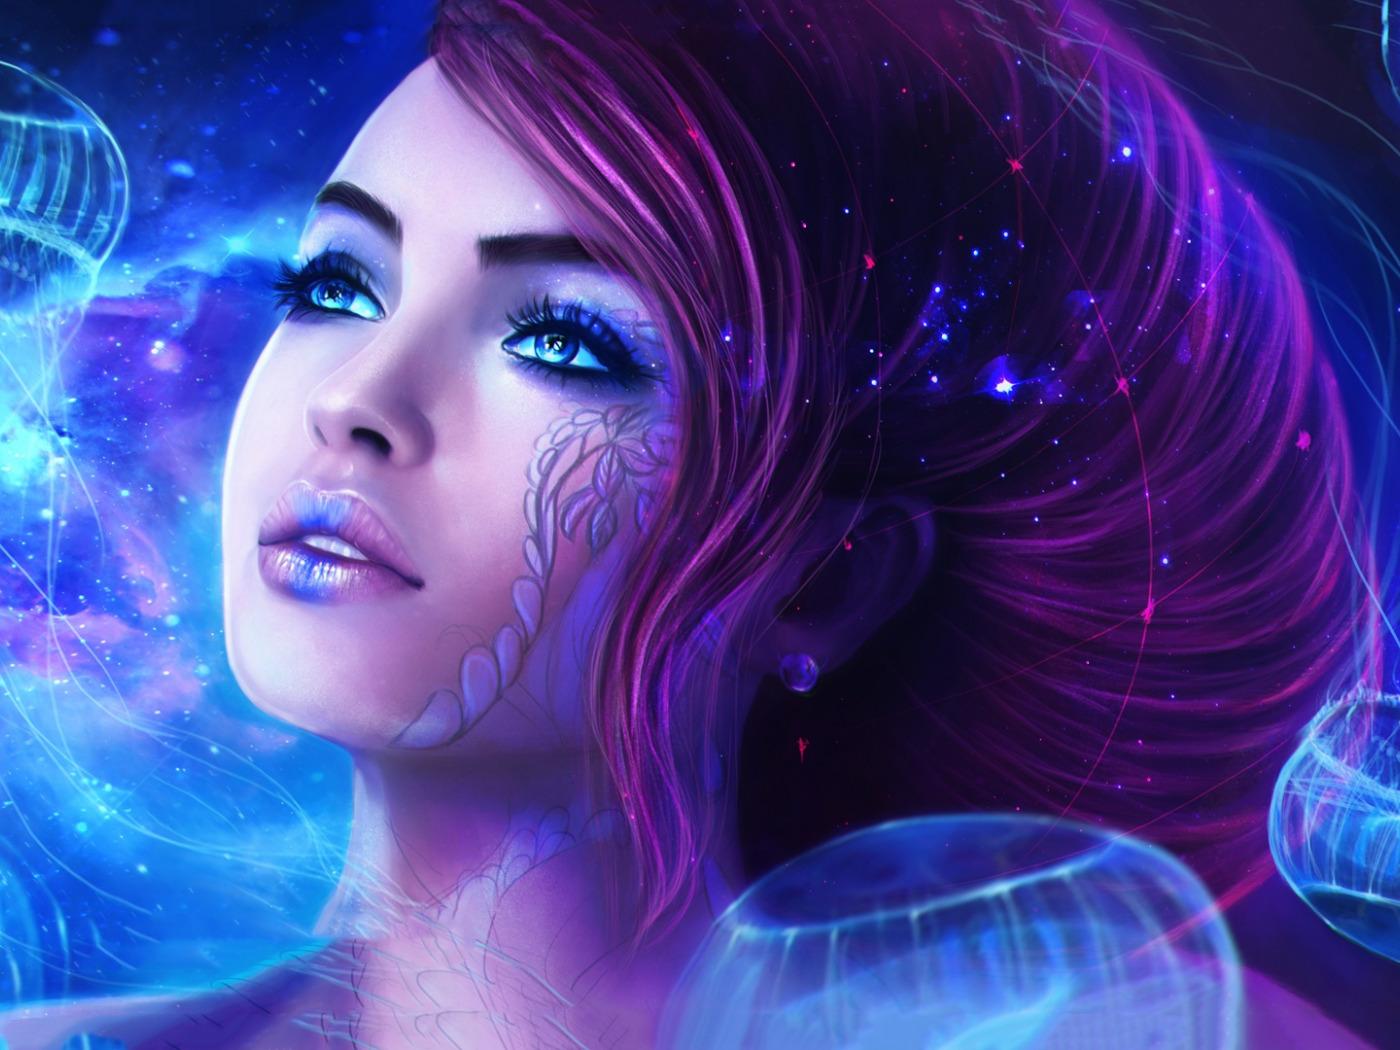 Заказ курск, картинки в космосе девушка